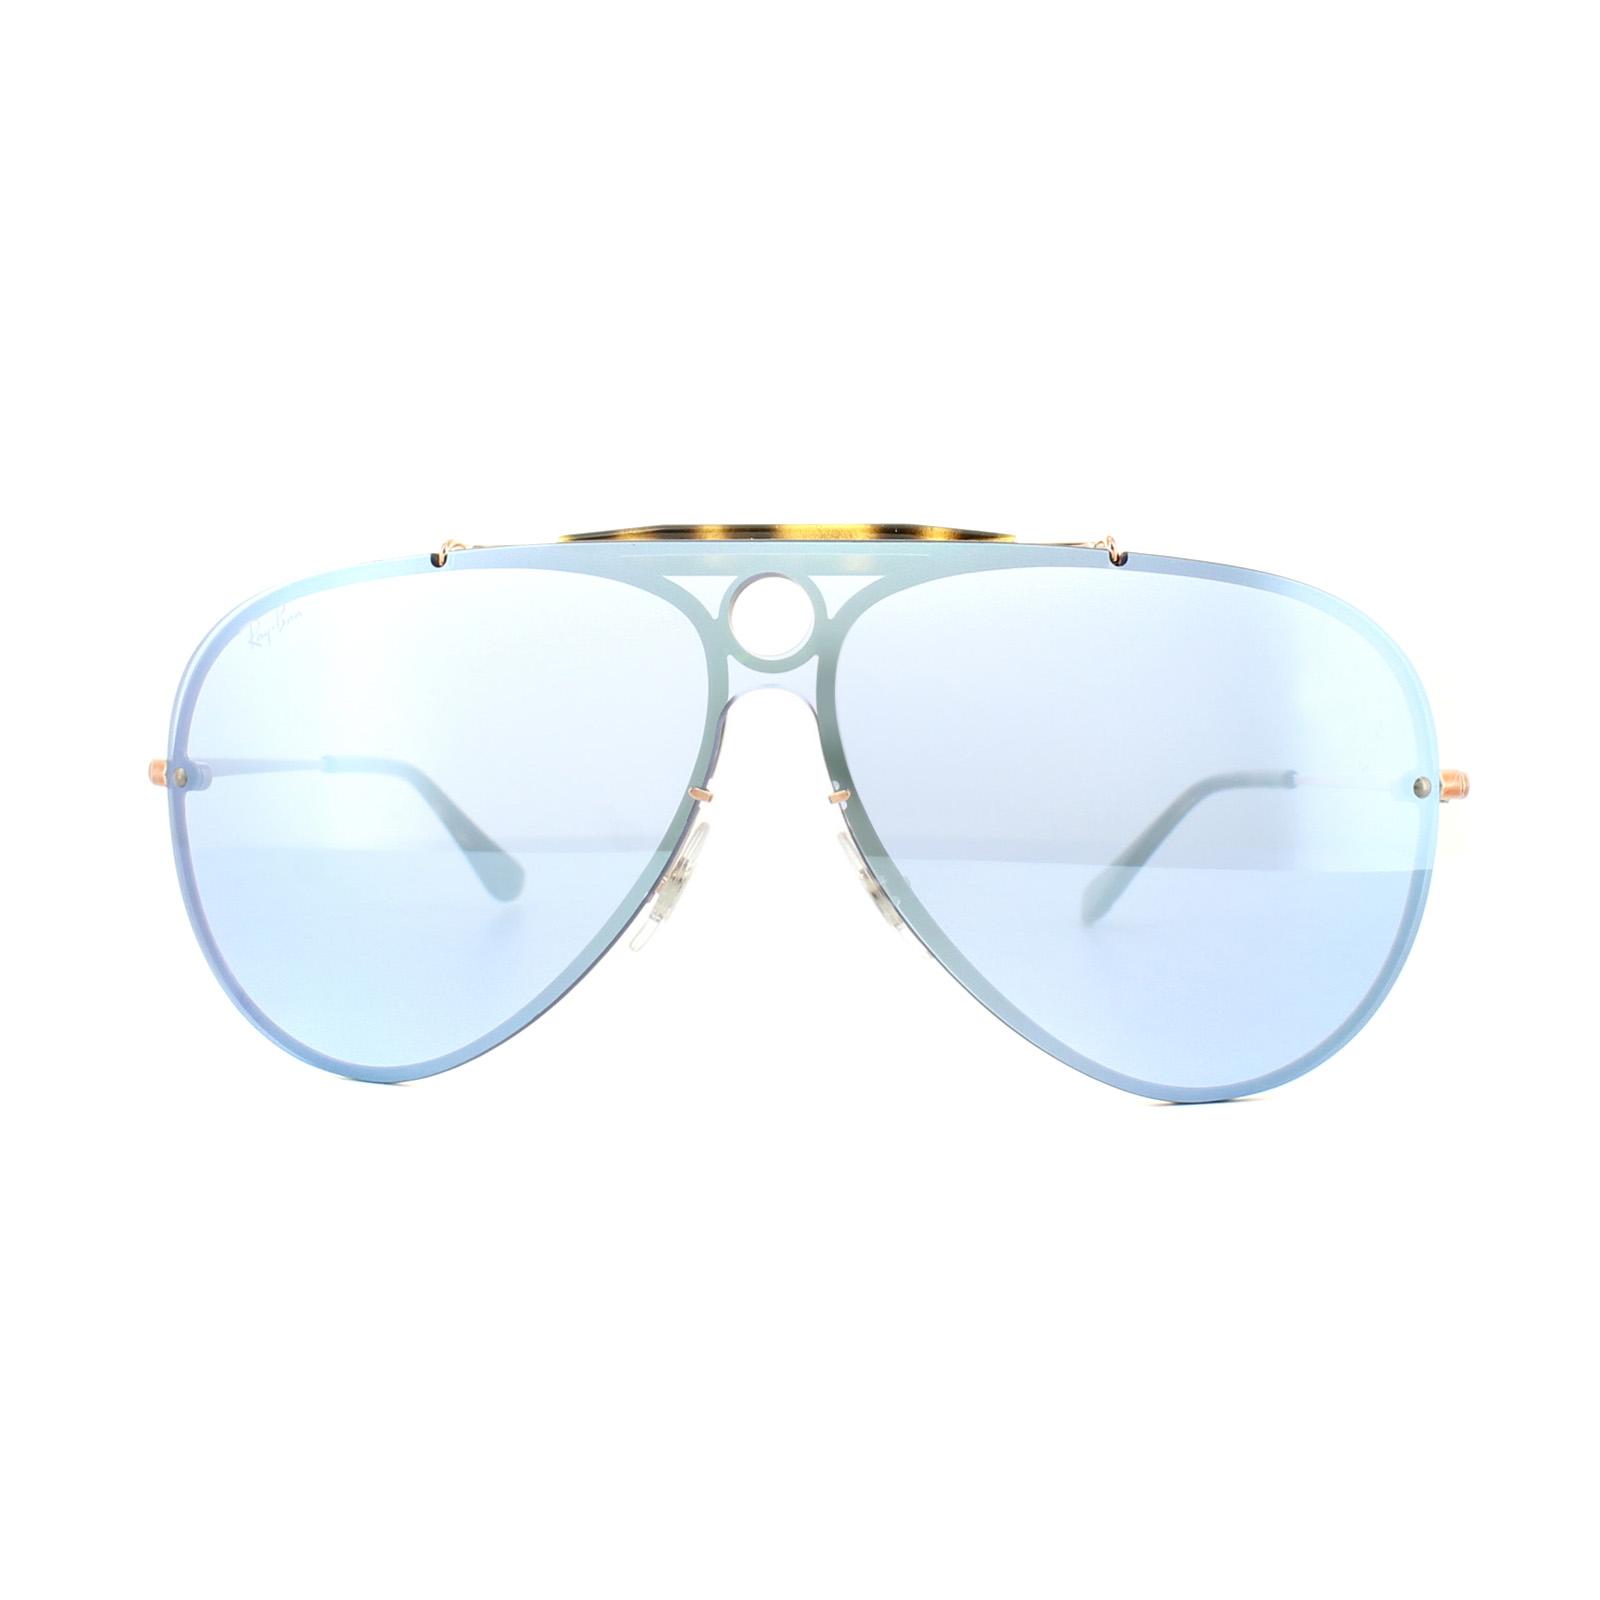 2384e1af080d1 Sentinel Ray-Ban Sunglasses Blaze Shooter 3581N 90351U Bronze Copper Violet  Silver Mirror